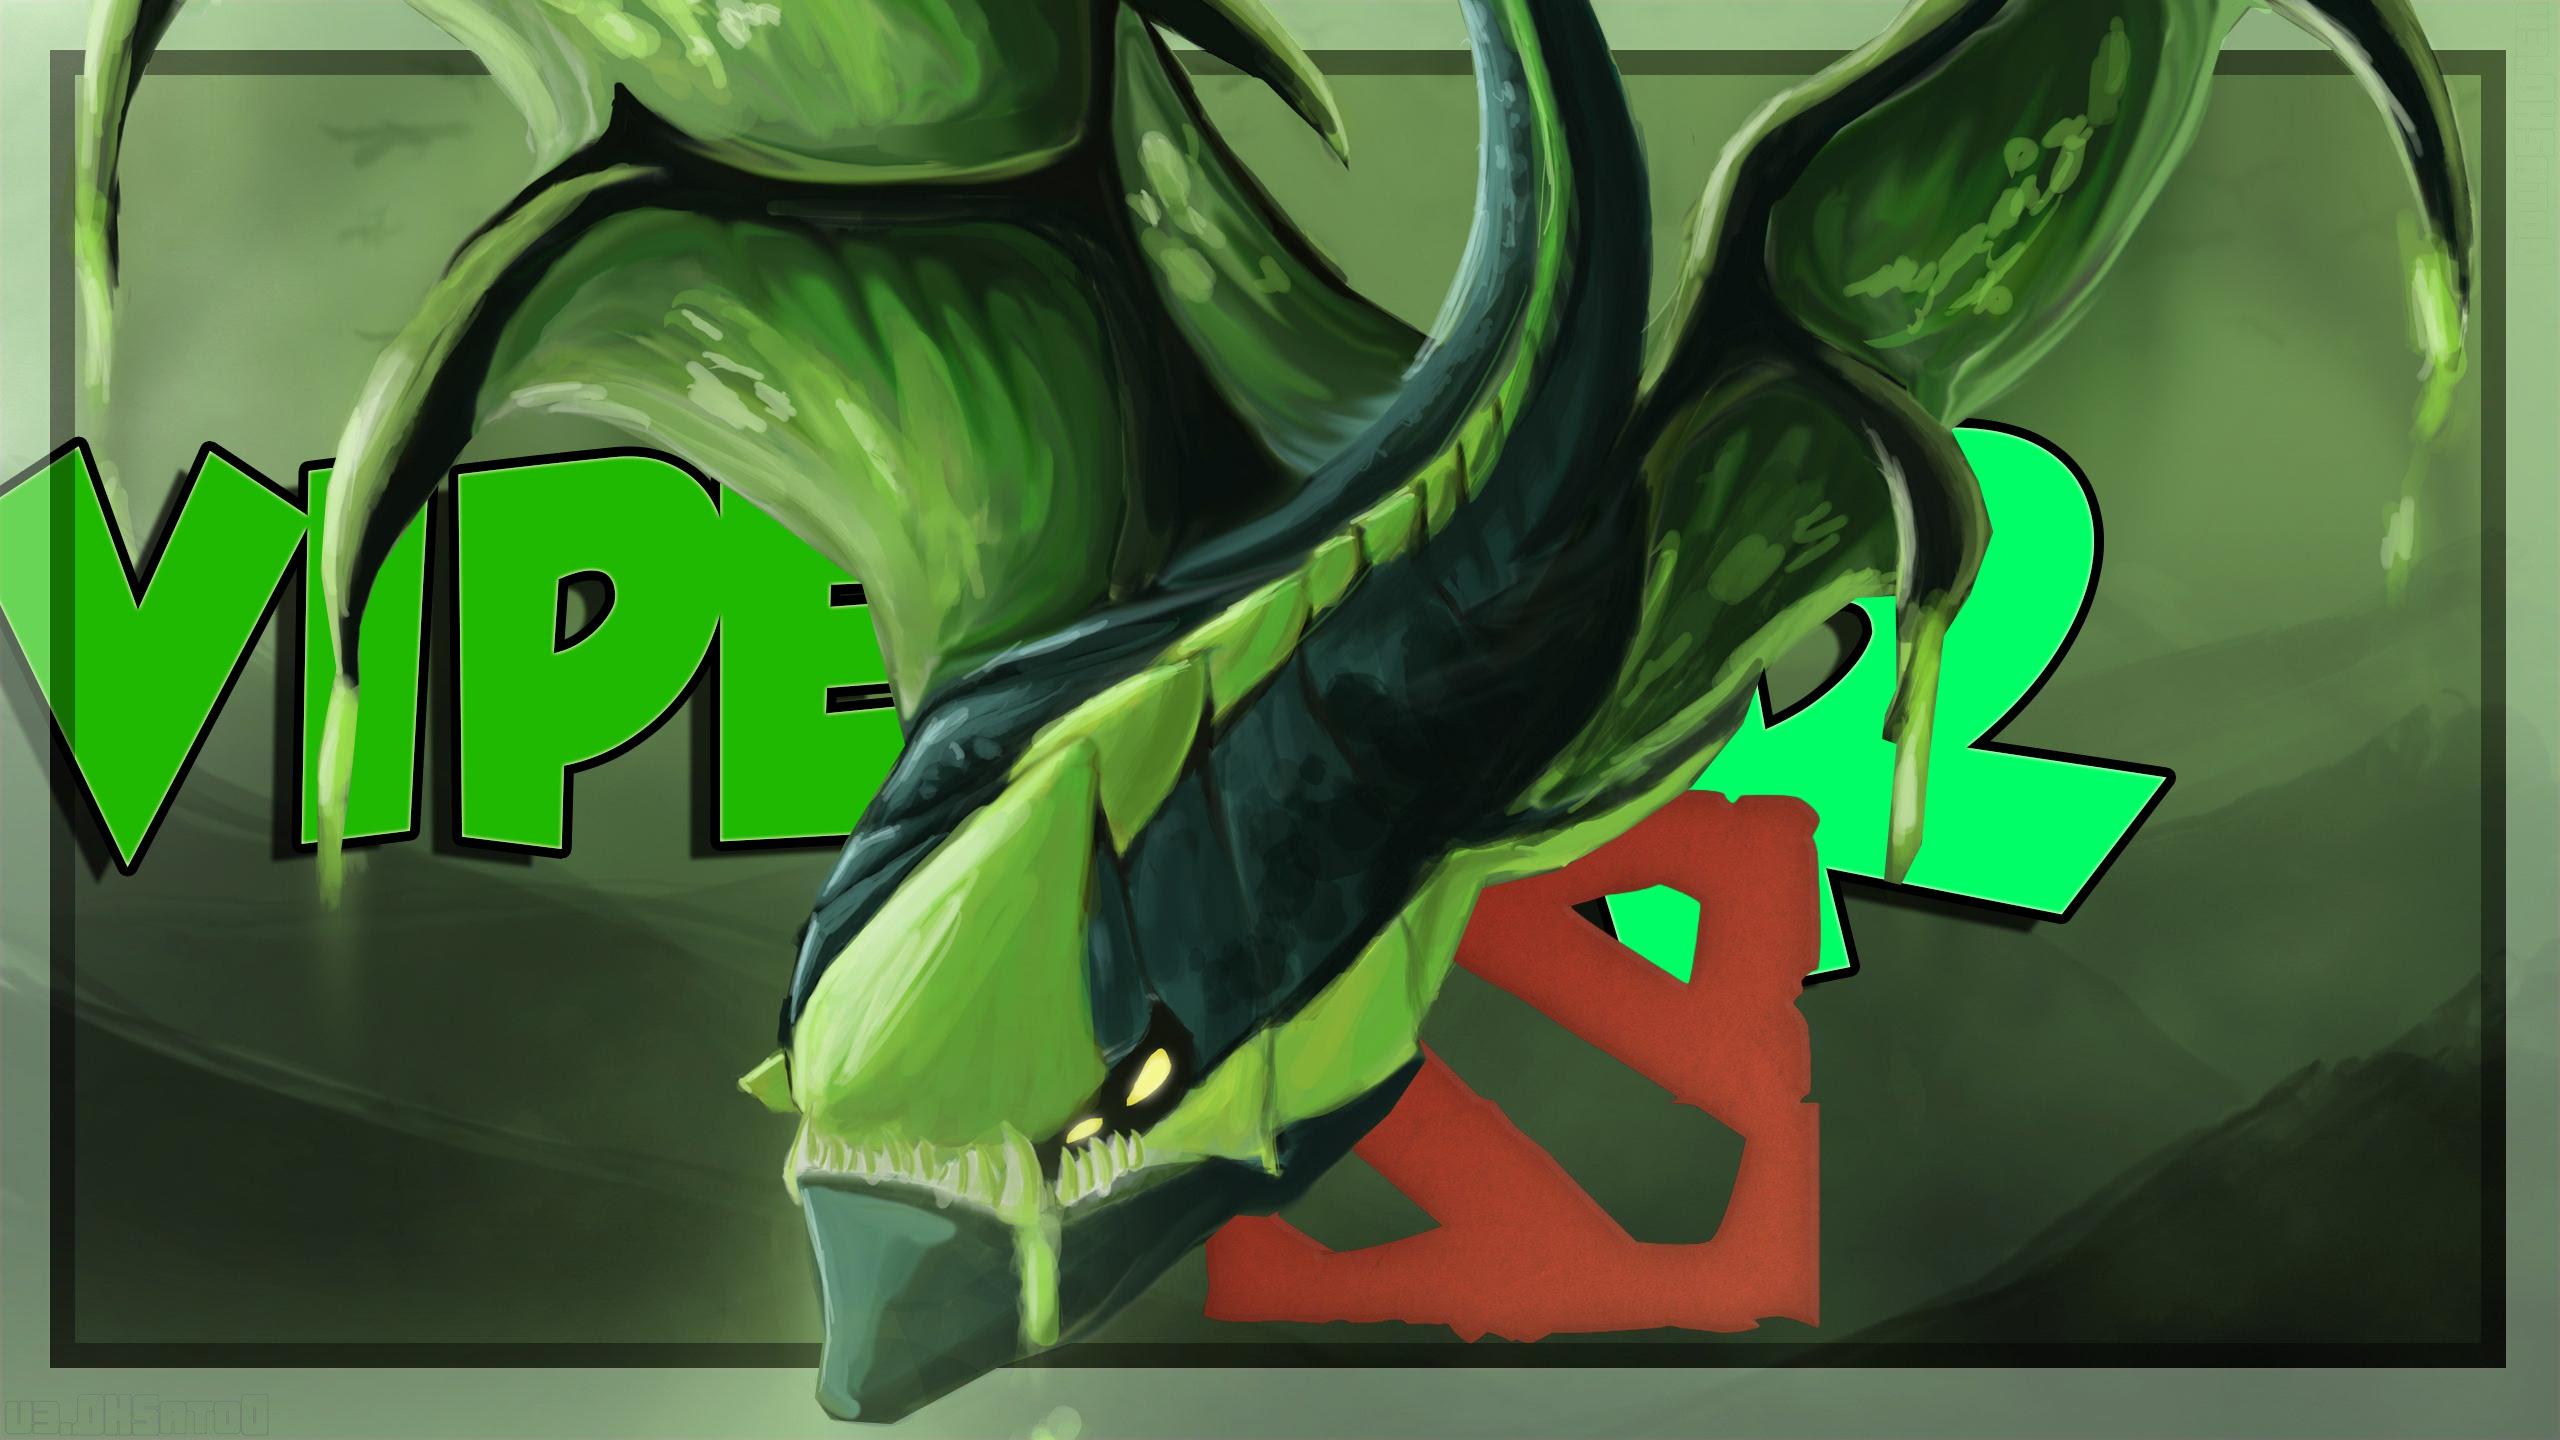 Dota2 : Viper Wallpaper